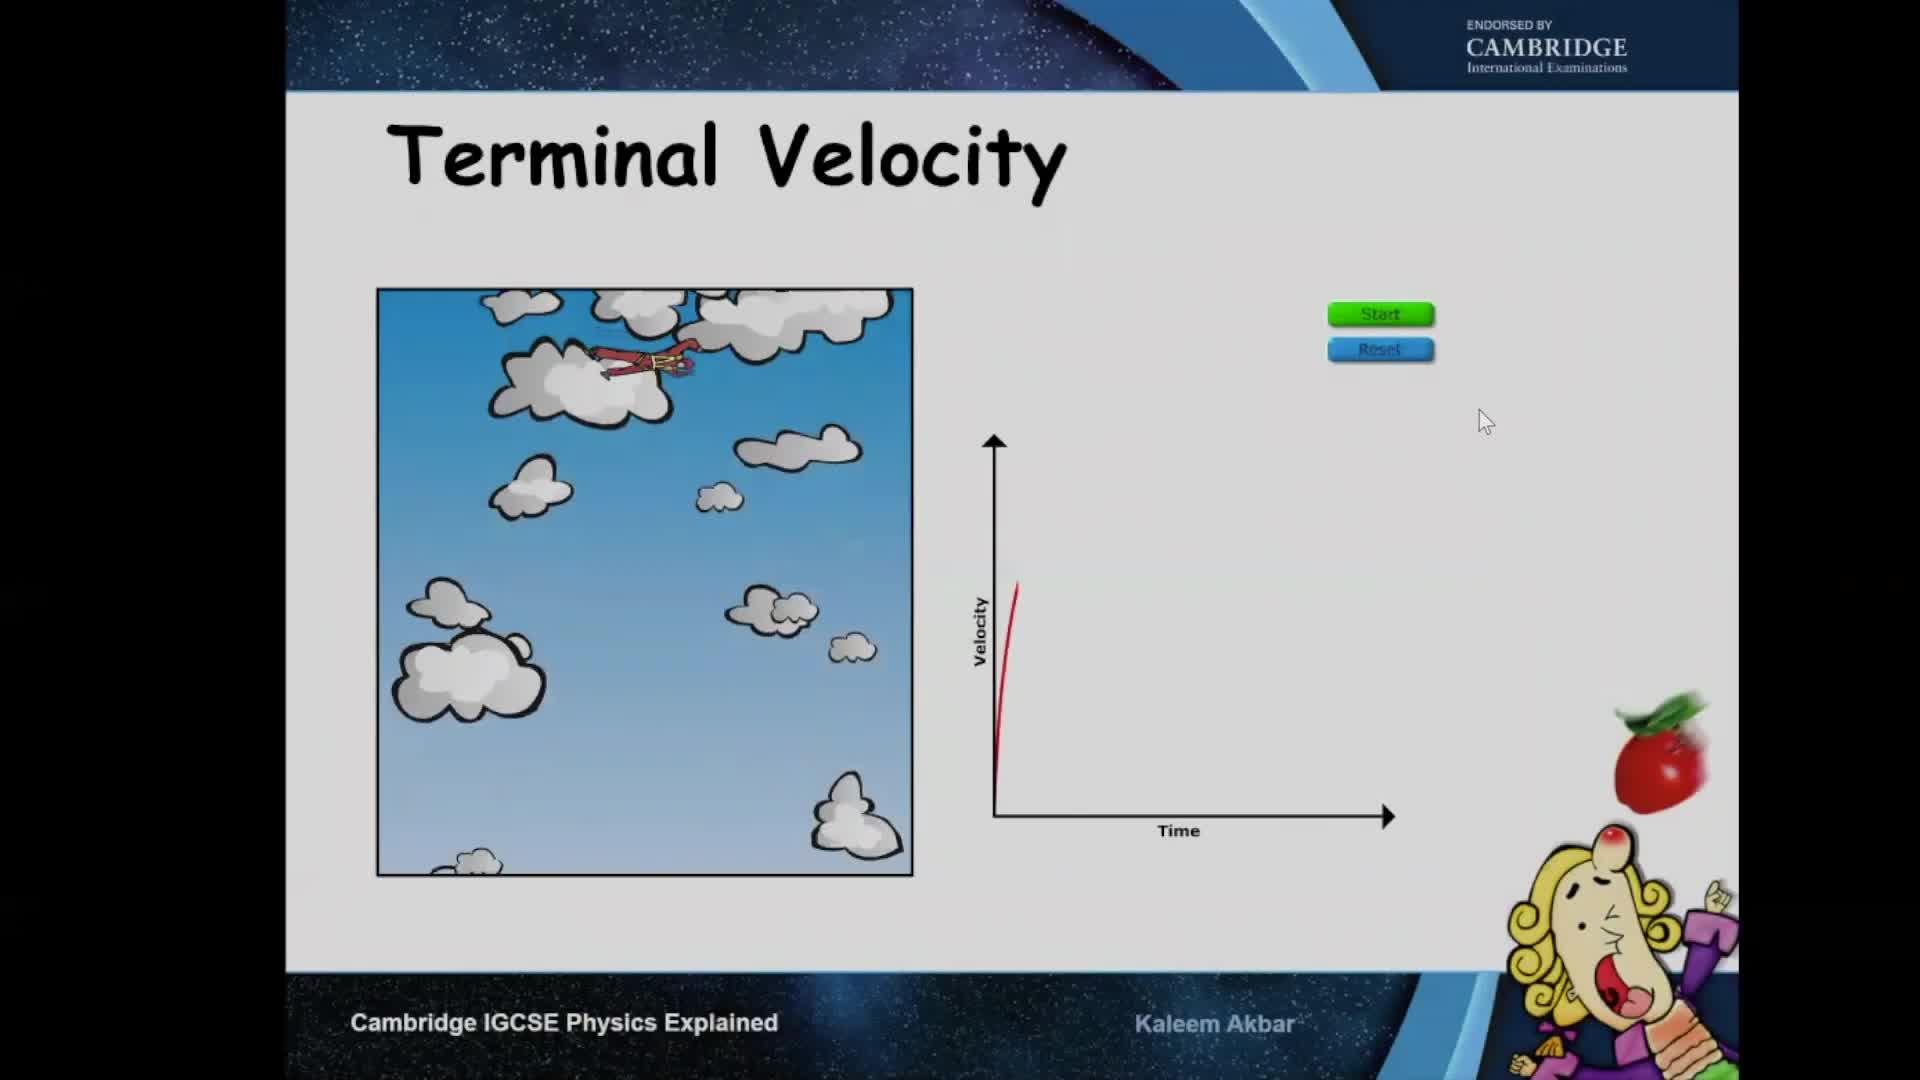 Film & Animation, IGCSE & International GCSE Physics with Kaleem Akbar, alevelphysics, gcsephysics, igcsephysics, physicsrevision, skydivedubai, terminalvelocity, Skydiving - Terminal Velocity GIFs